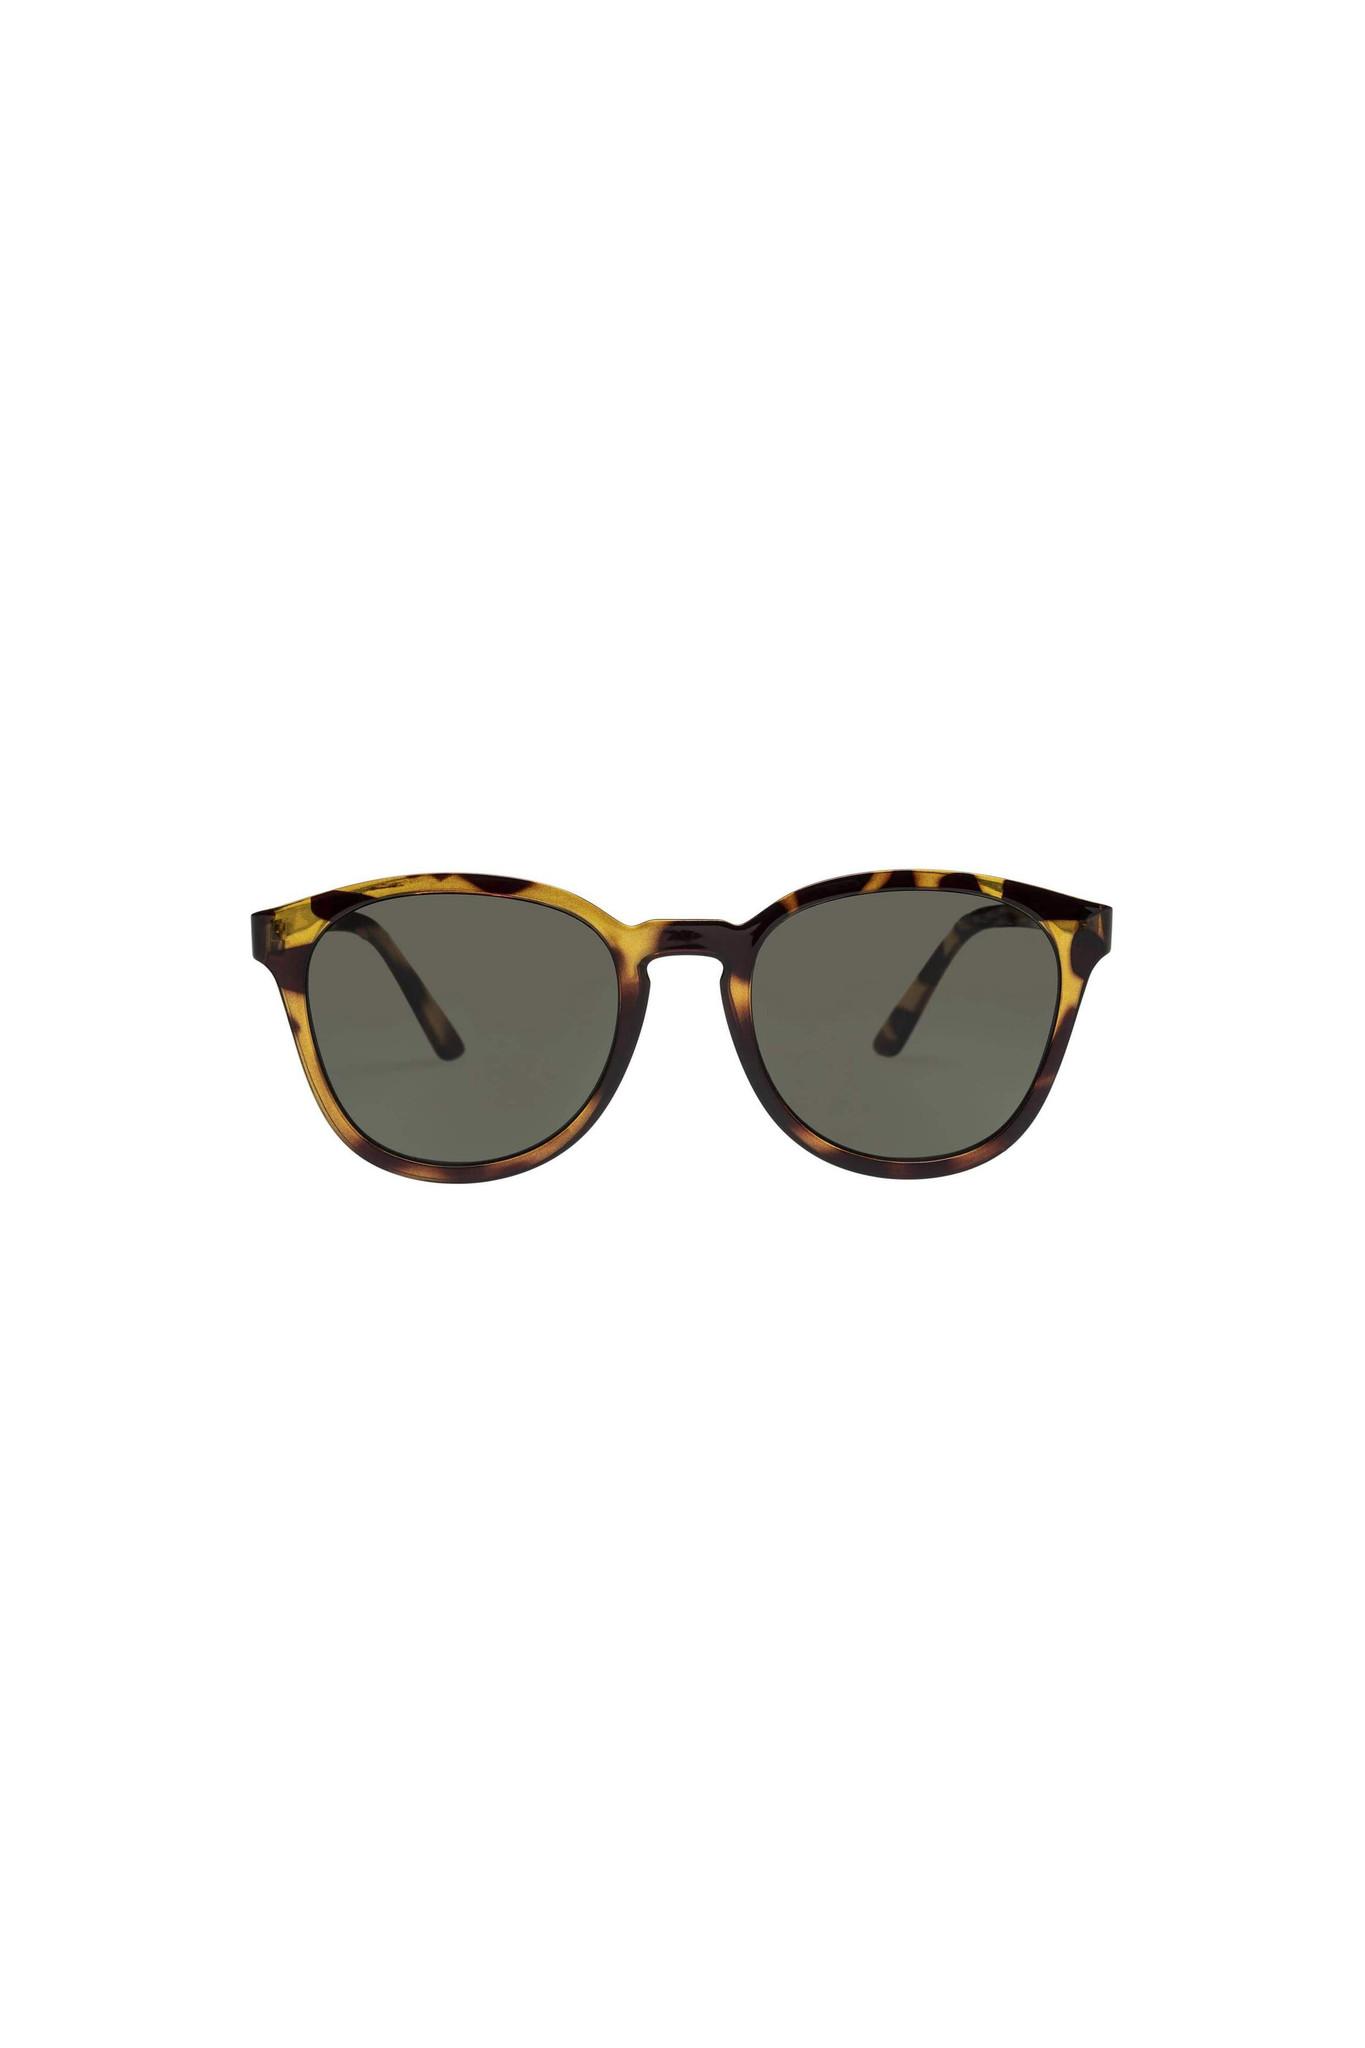 Le Specs Renegade Sunglasses - Tortoise